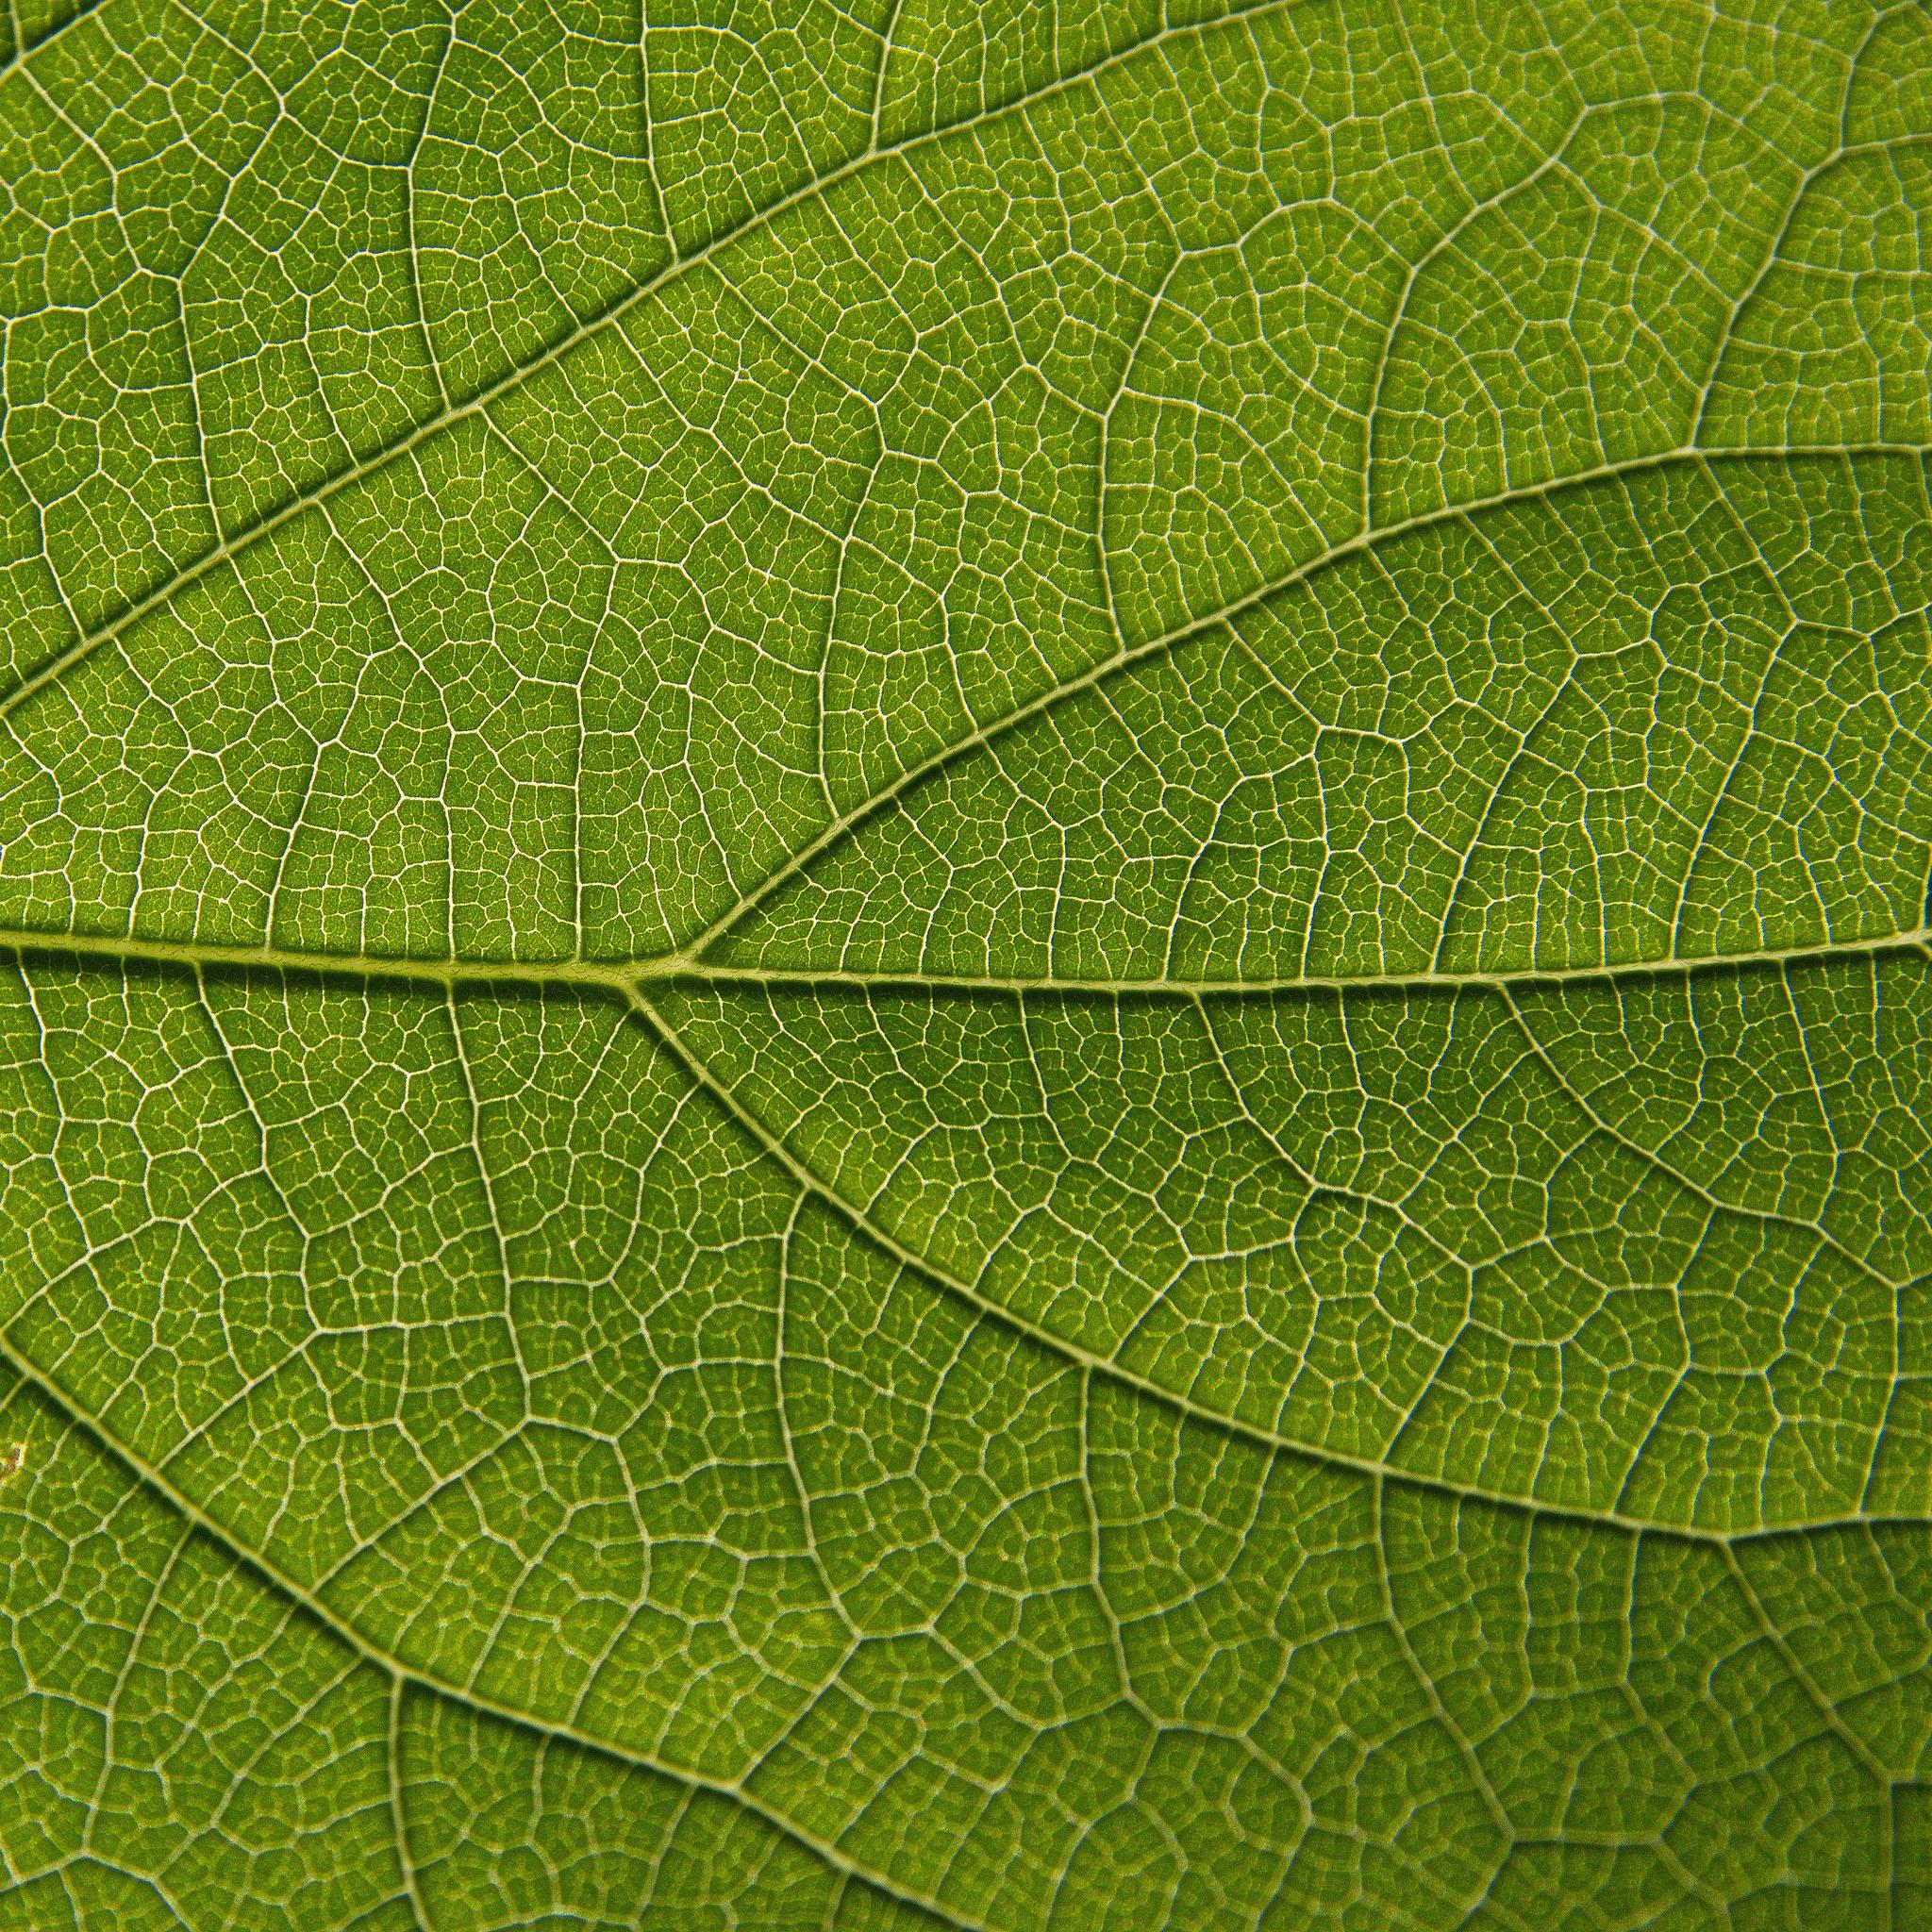 brent leimenstoll - macro leaf texutre ipad wallpaper